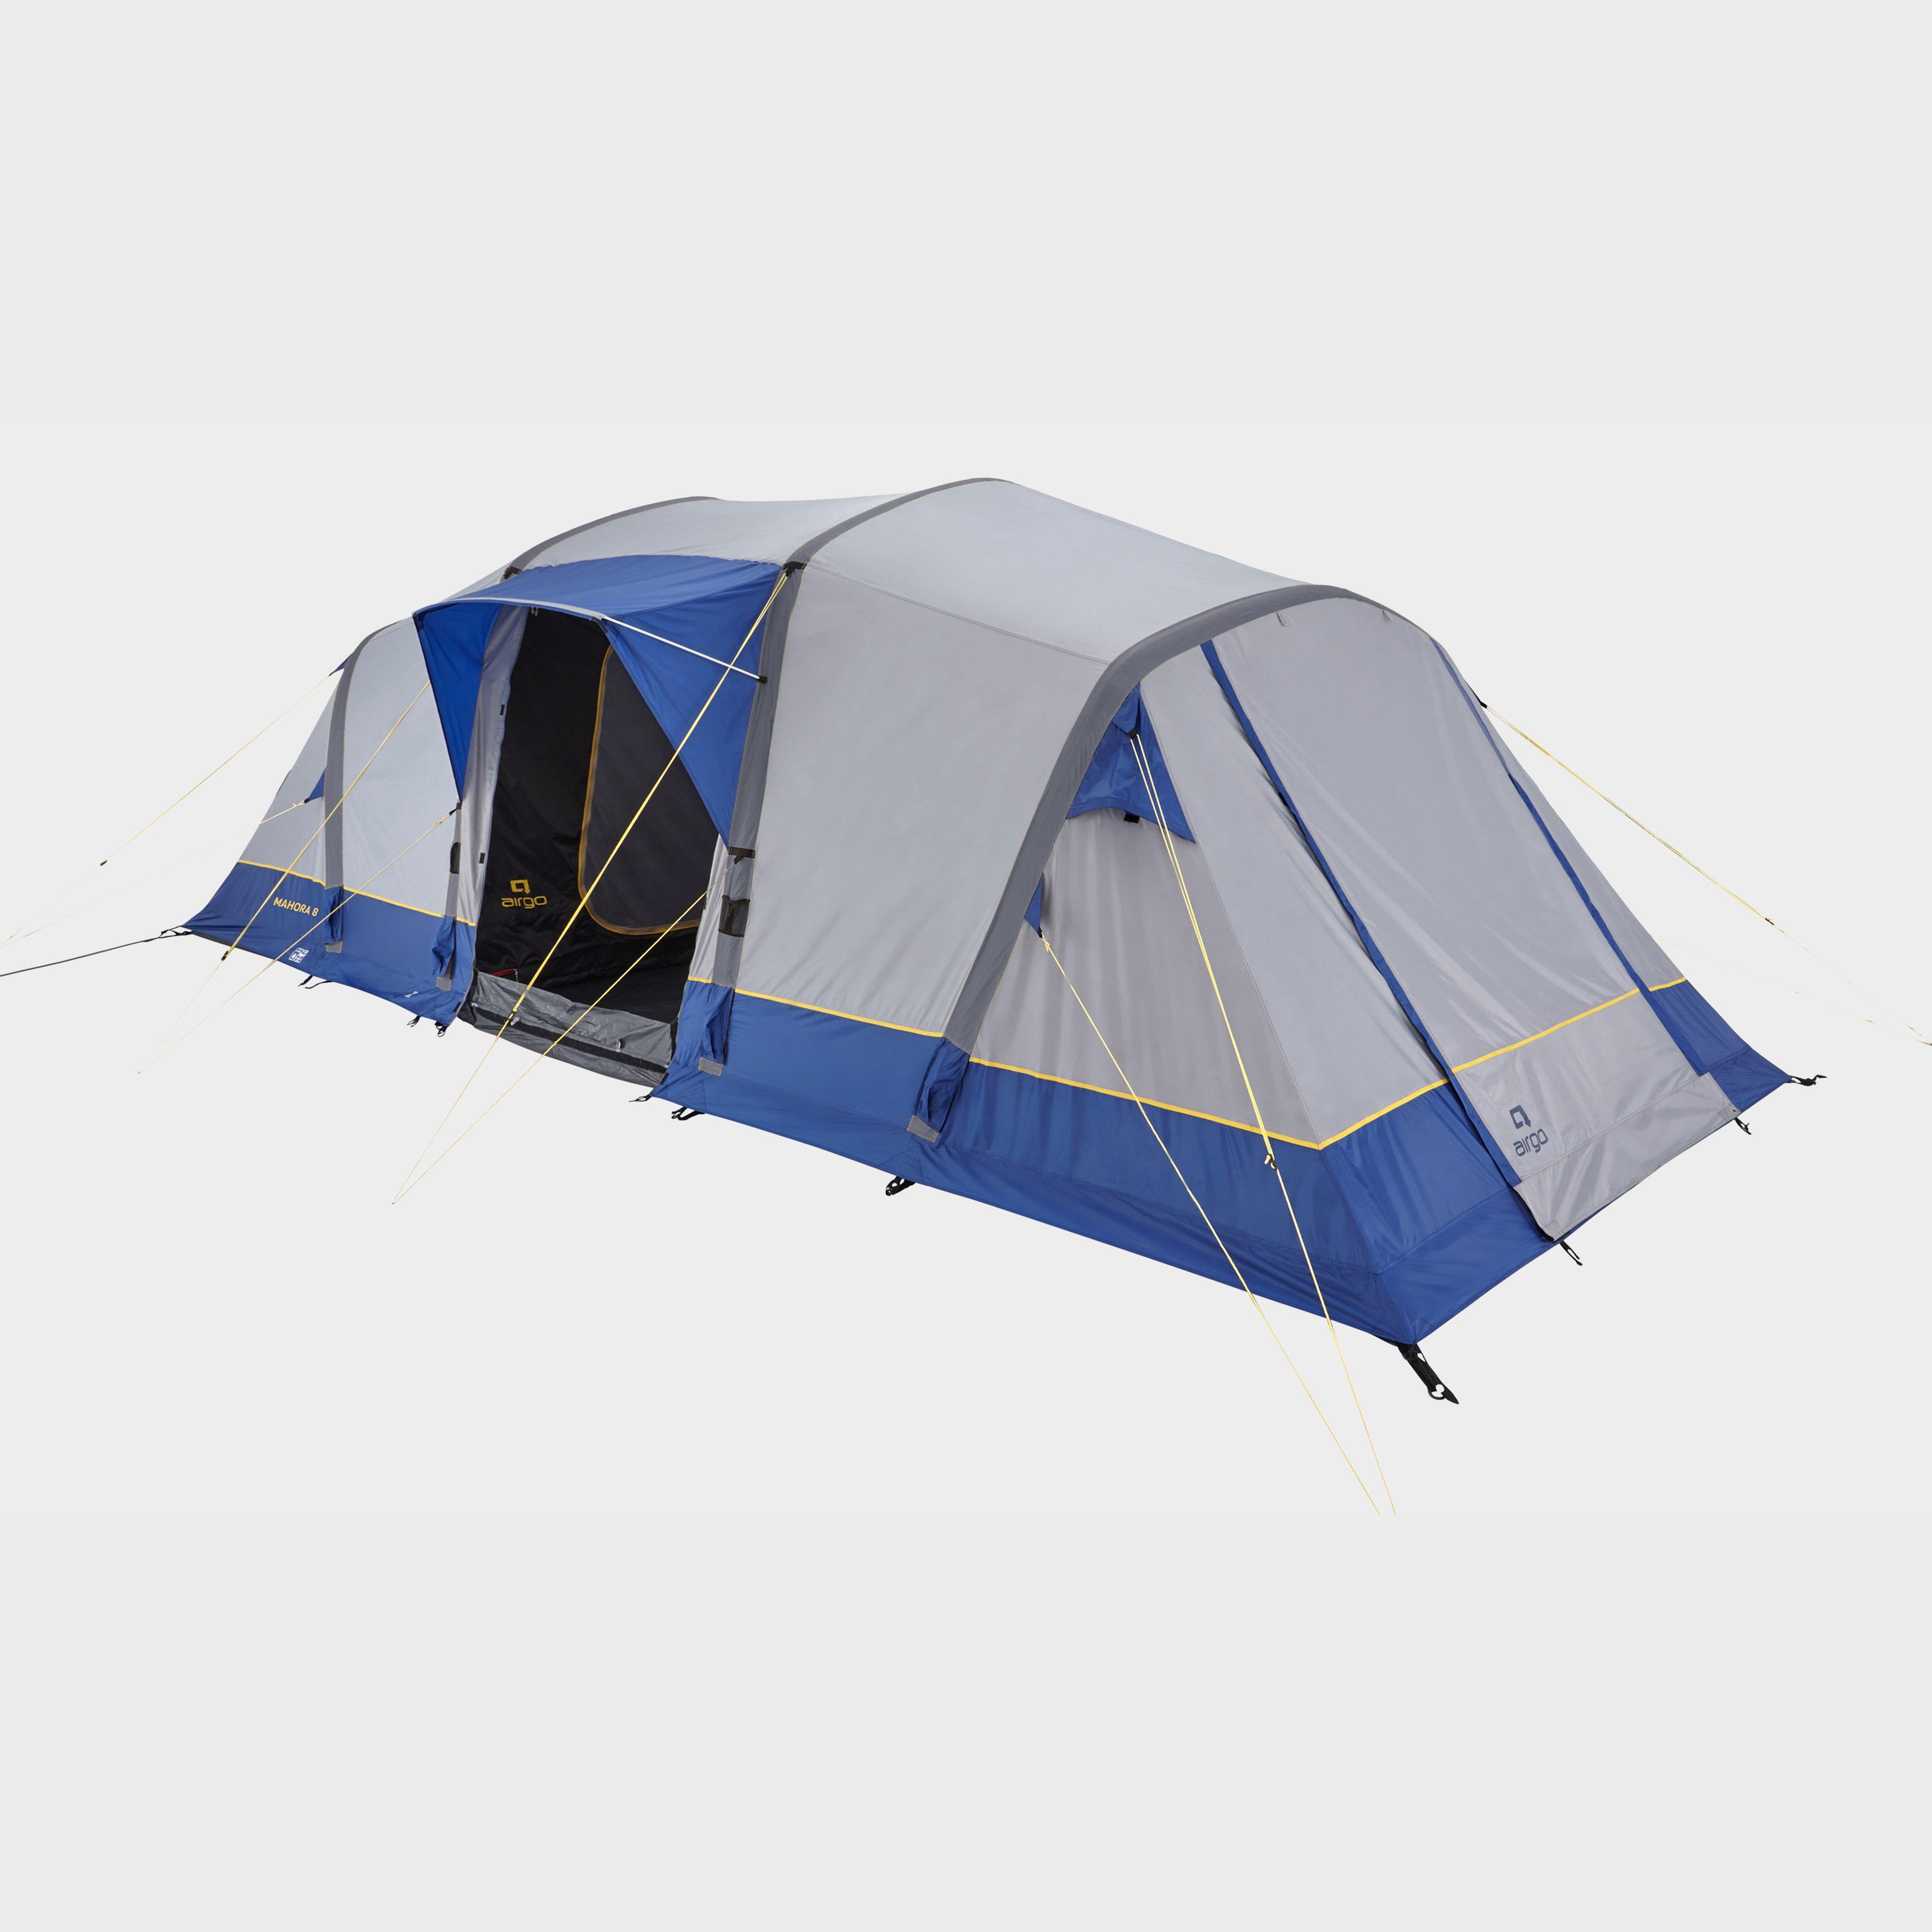 Airgo Mahora 8 Inflatable Tent